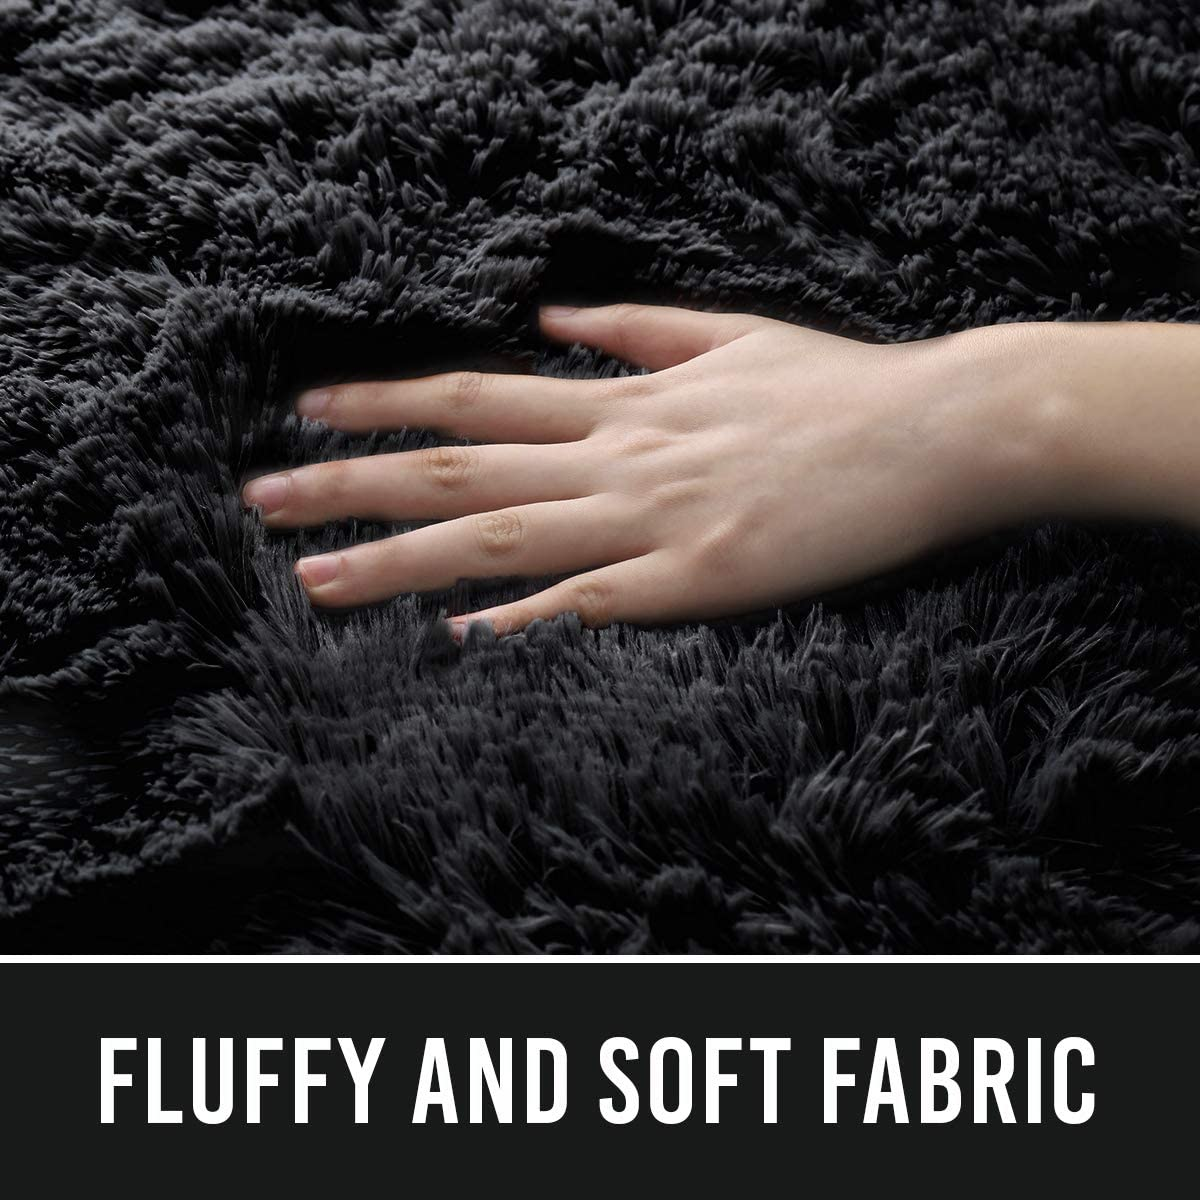 4x6 Feet Black Extra Comfy Furry Rugs Modern Solid Color Cute Carpets ECOBER Premium Velvet Fluffy Area Rug Plush Soft Carpet for Bedroom Living Room